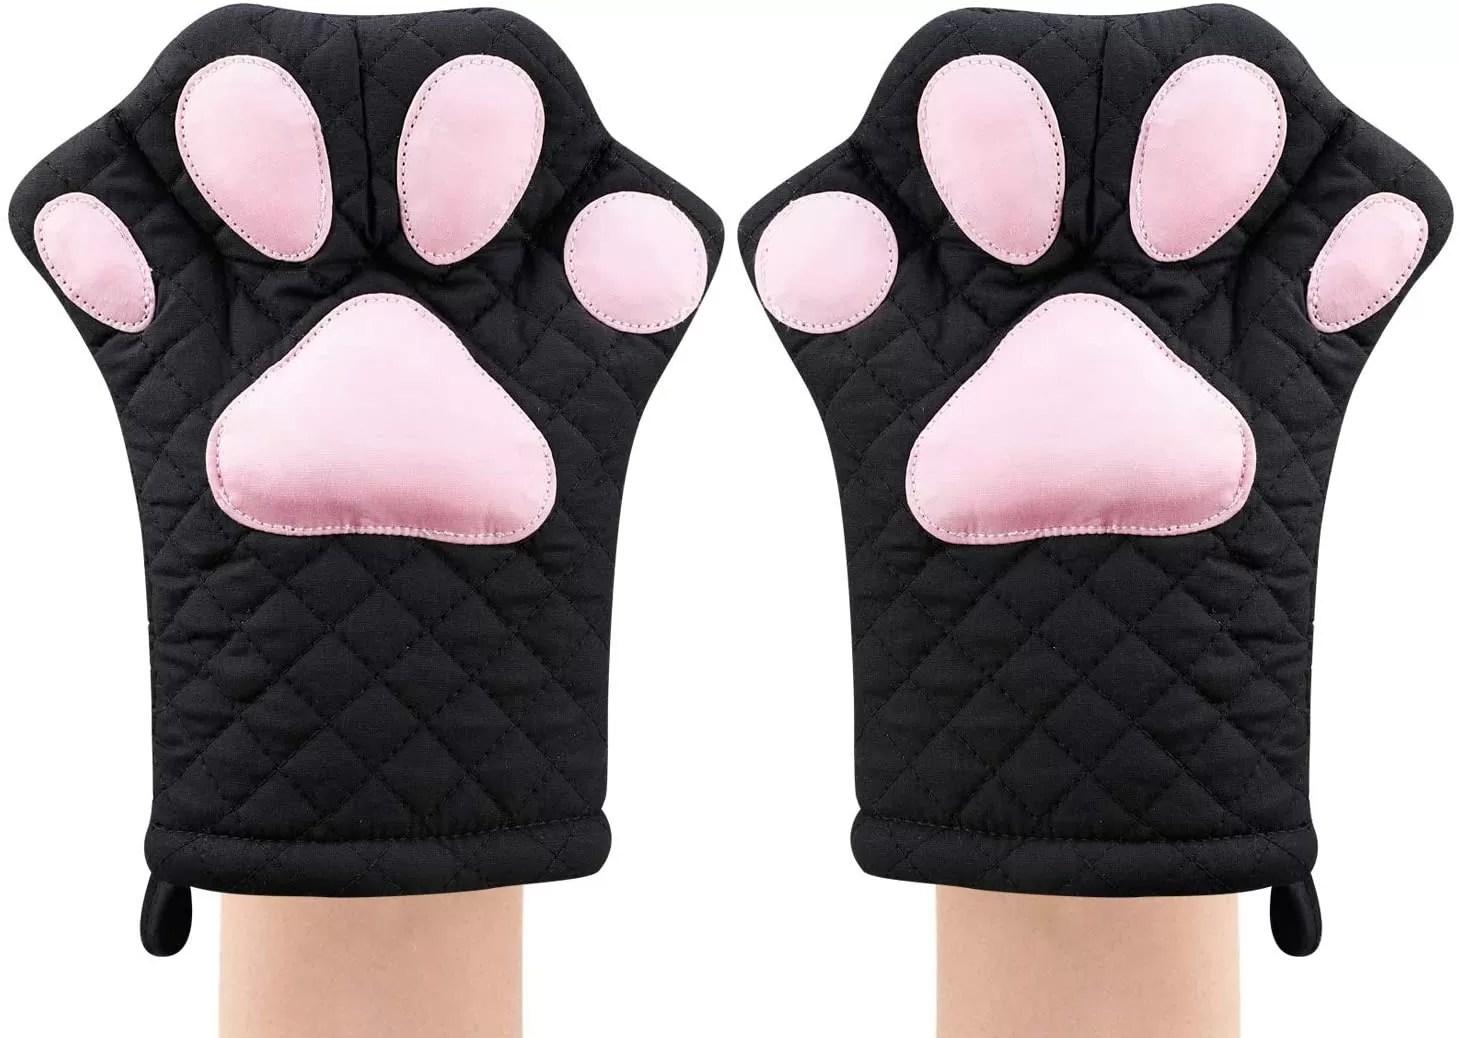 Ayomi Cat heat resistant oven mitts